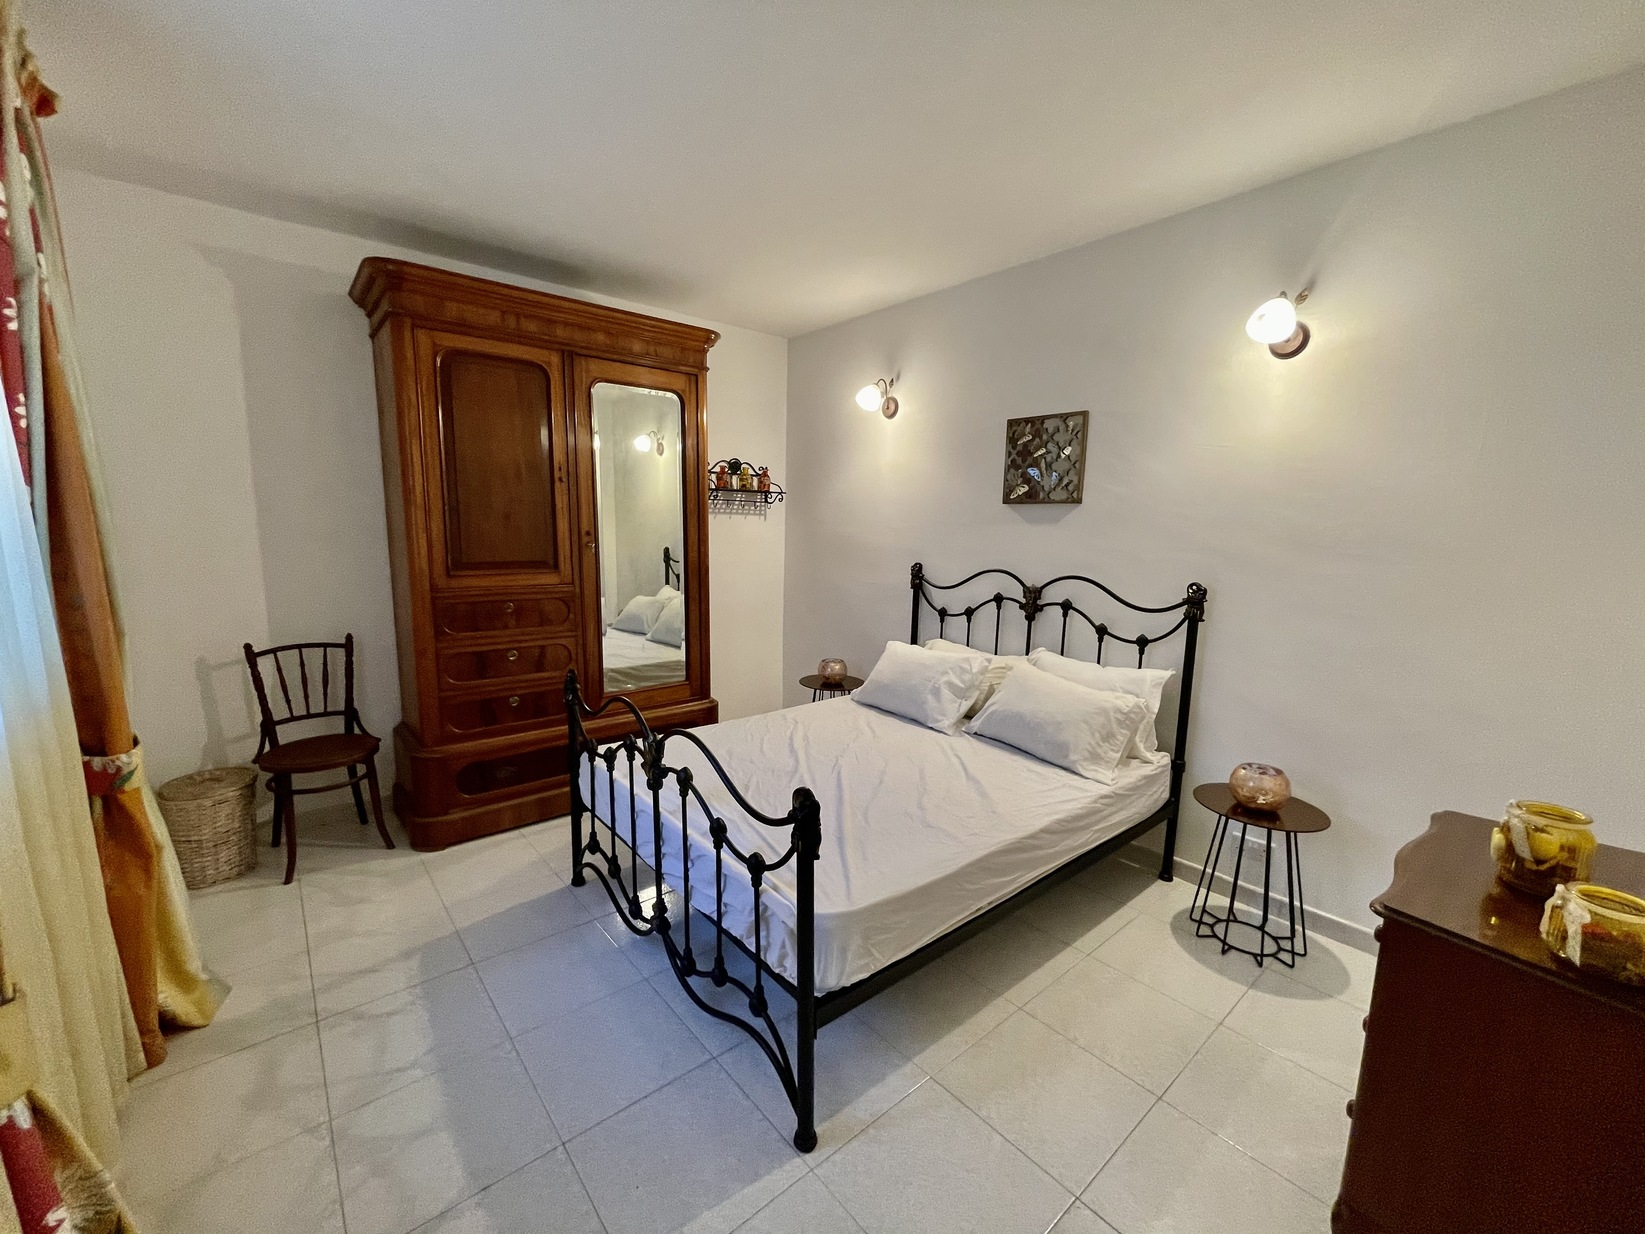 2 bed Apartment For Rent in Sliema, Sliema - thumb 18